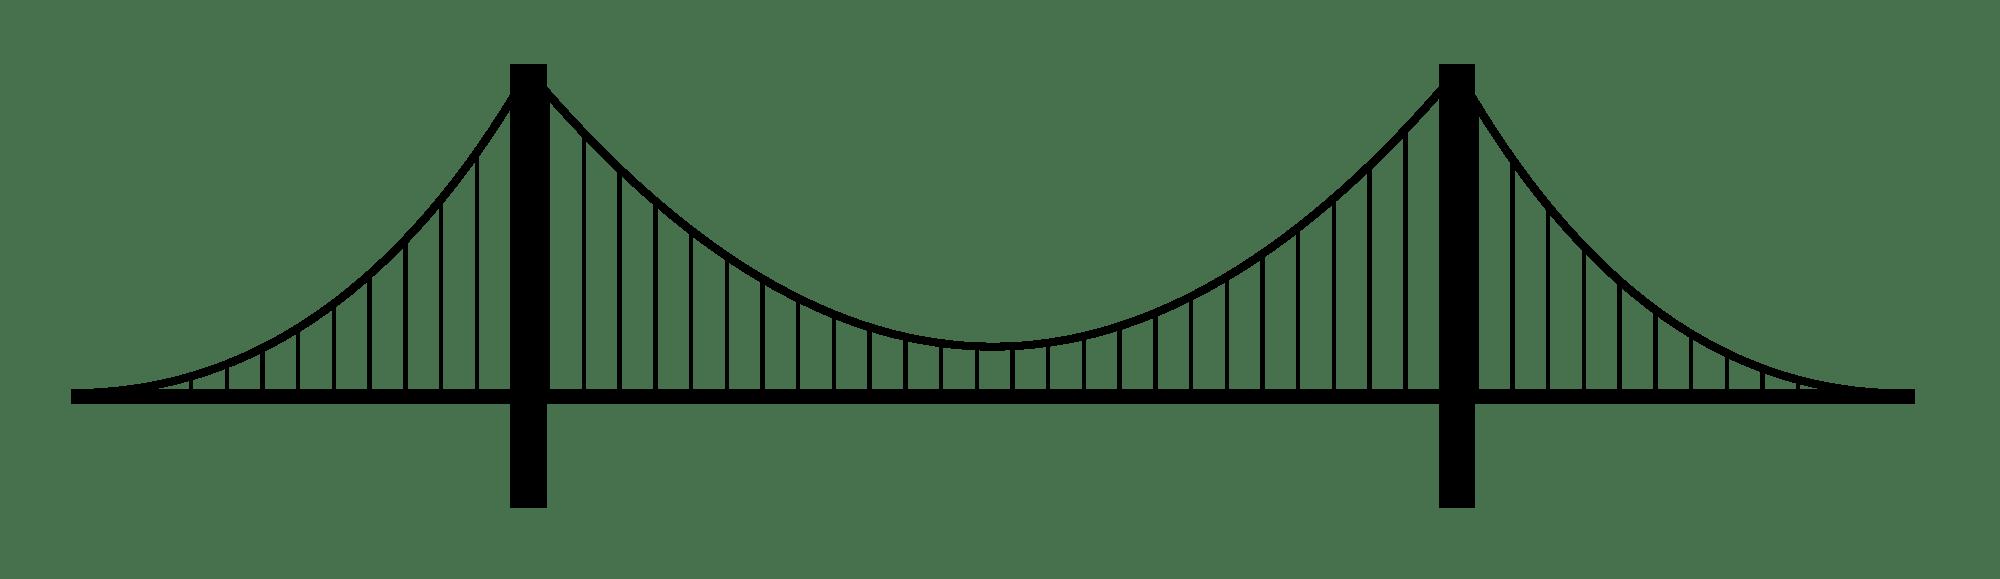 Brooklyn Bridge Wallpaper Black And White Github Parrot Developers Node Flower Bridge Ble Cloud